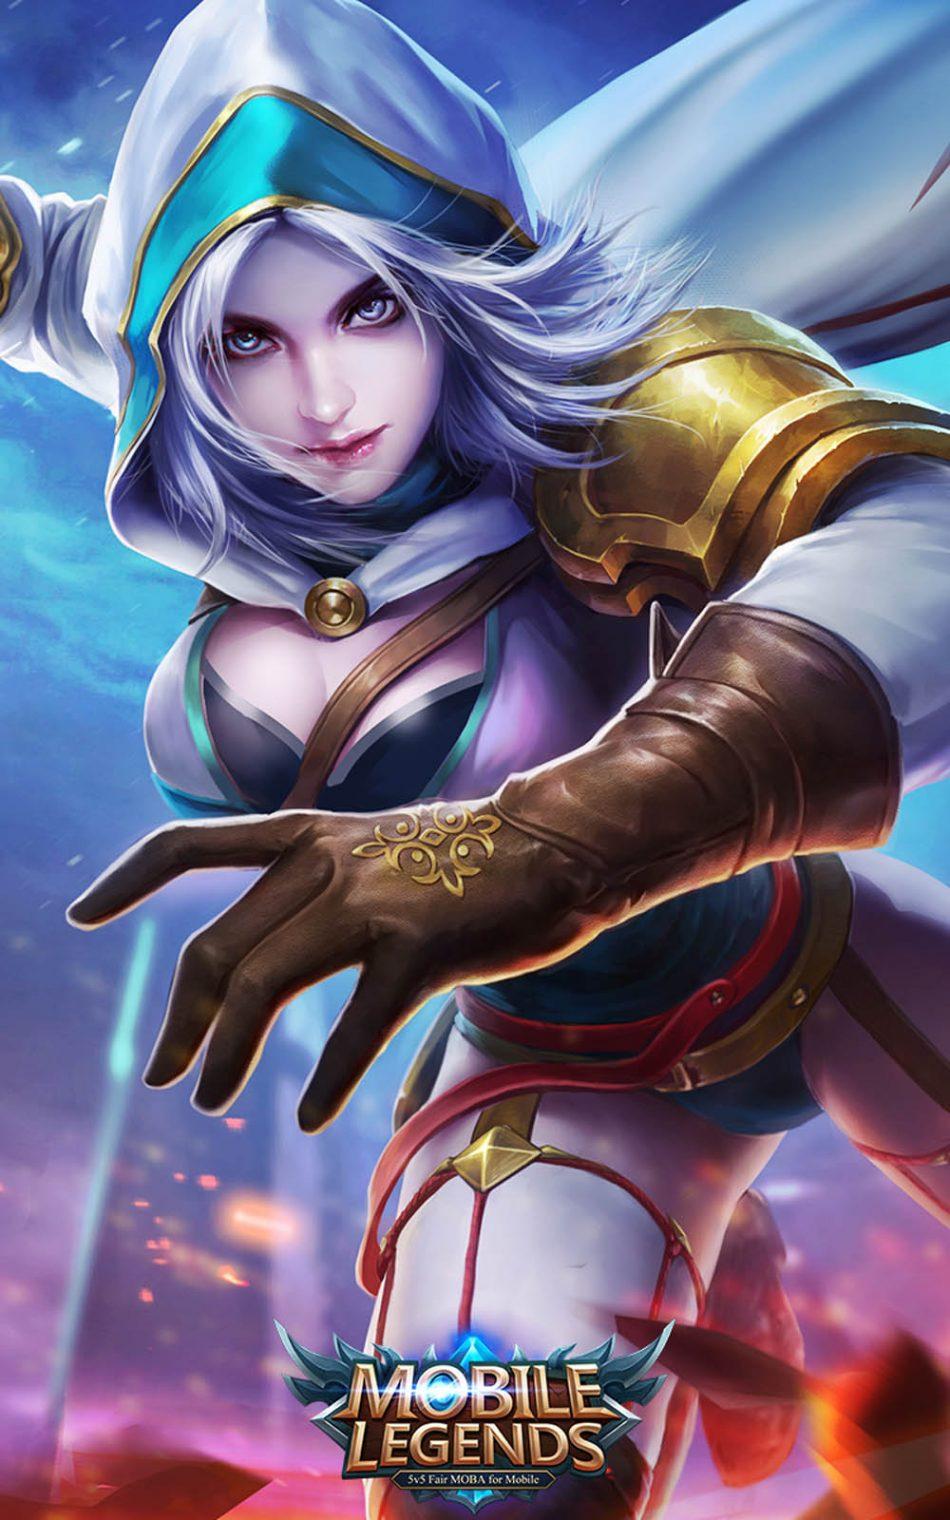 Download Natalia Mobile Legends Hero Free Pure 4k Ultra Hd Mobile Wallpaper